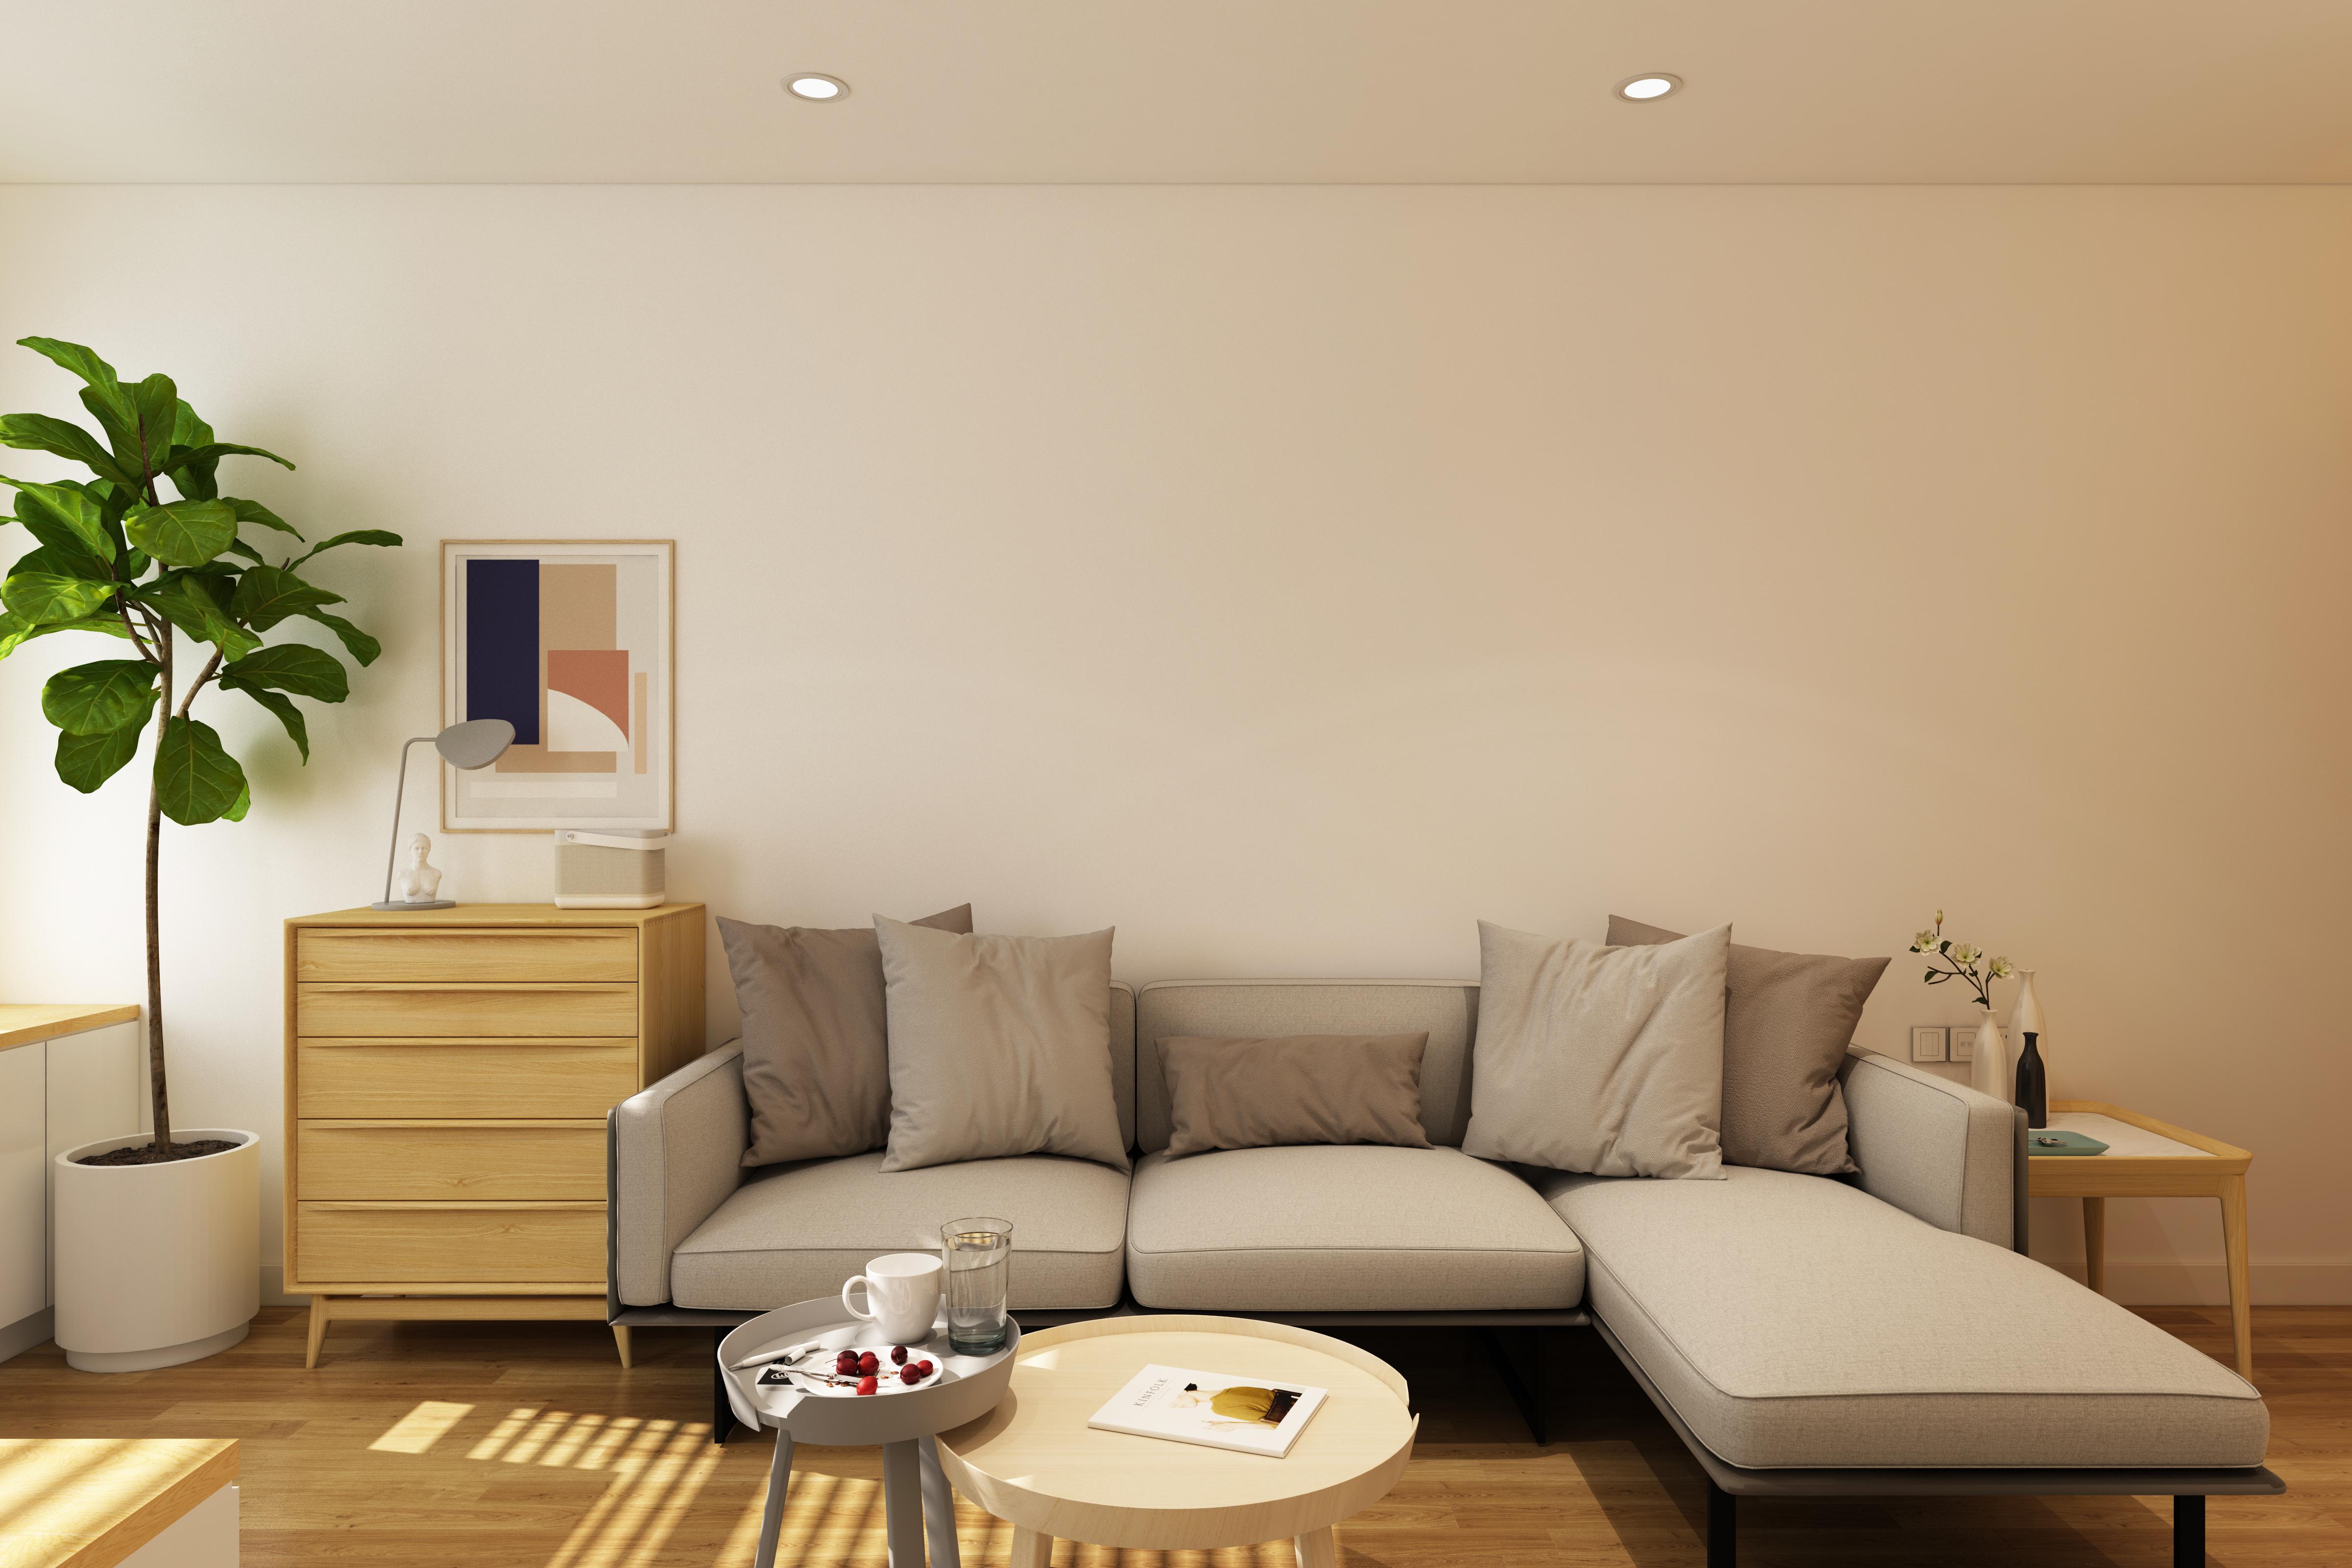 45m小户型loft公寓走心设计,公租房装修成北欧风高级住